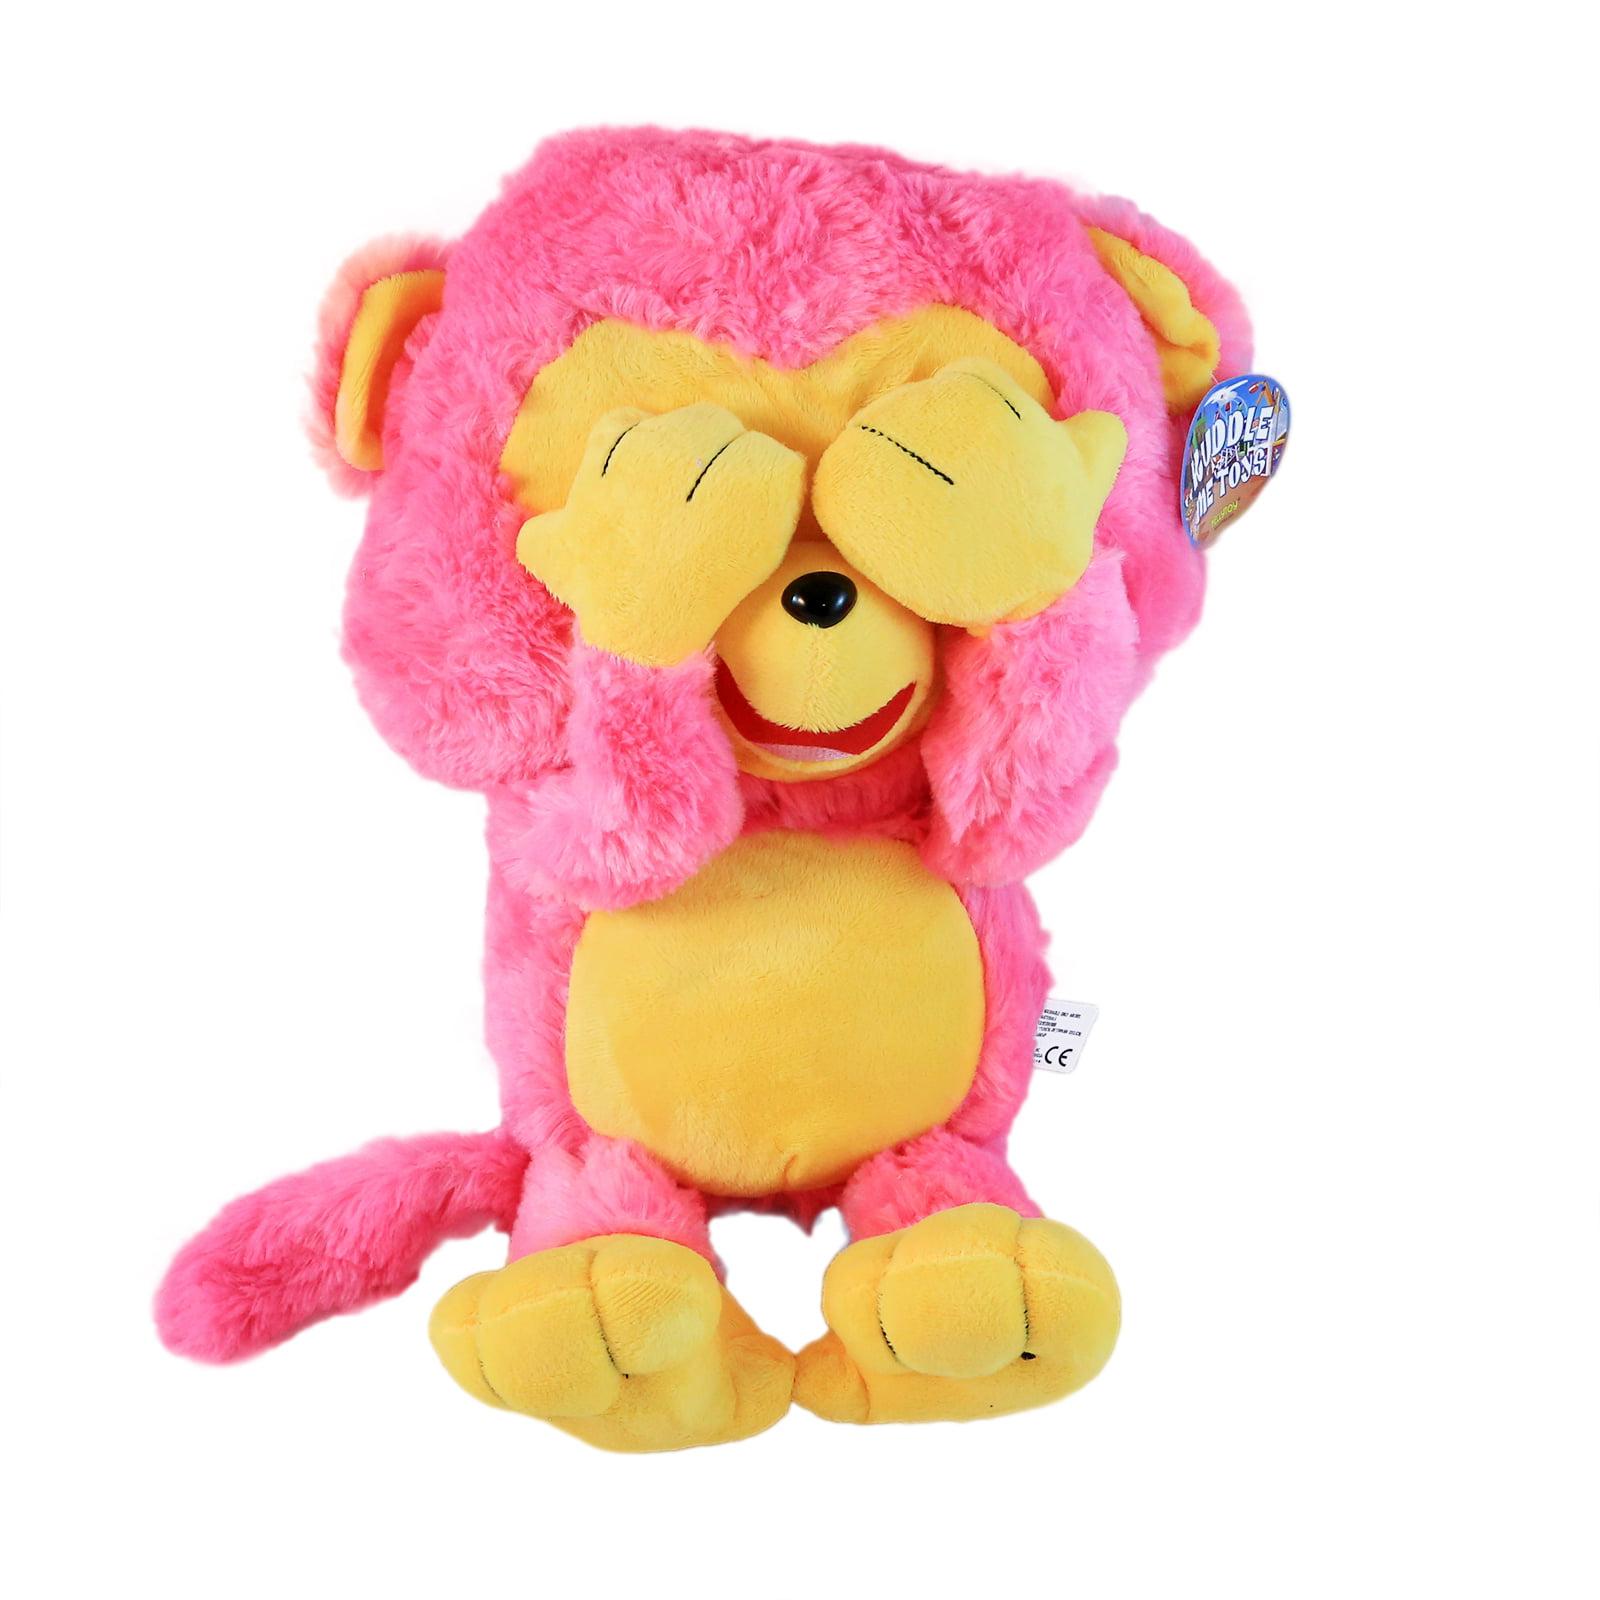 KidPlay Kuddle Toy Hear See Speak No Evil Plush Monkey Stuffed Animal (3 Colors)